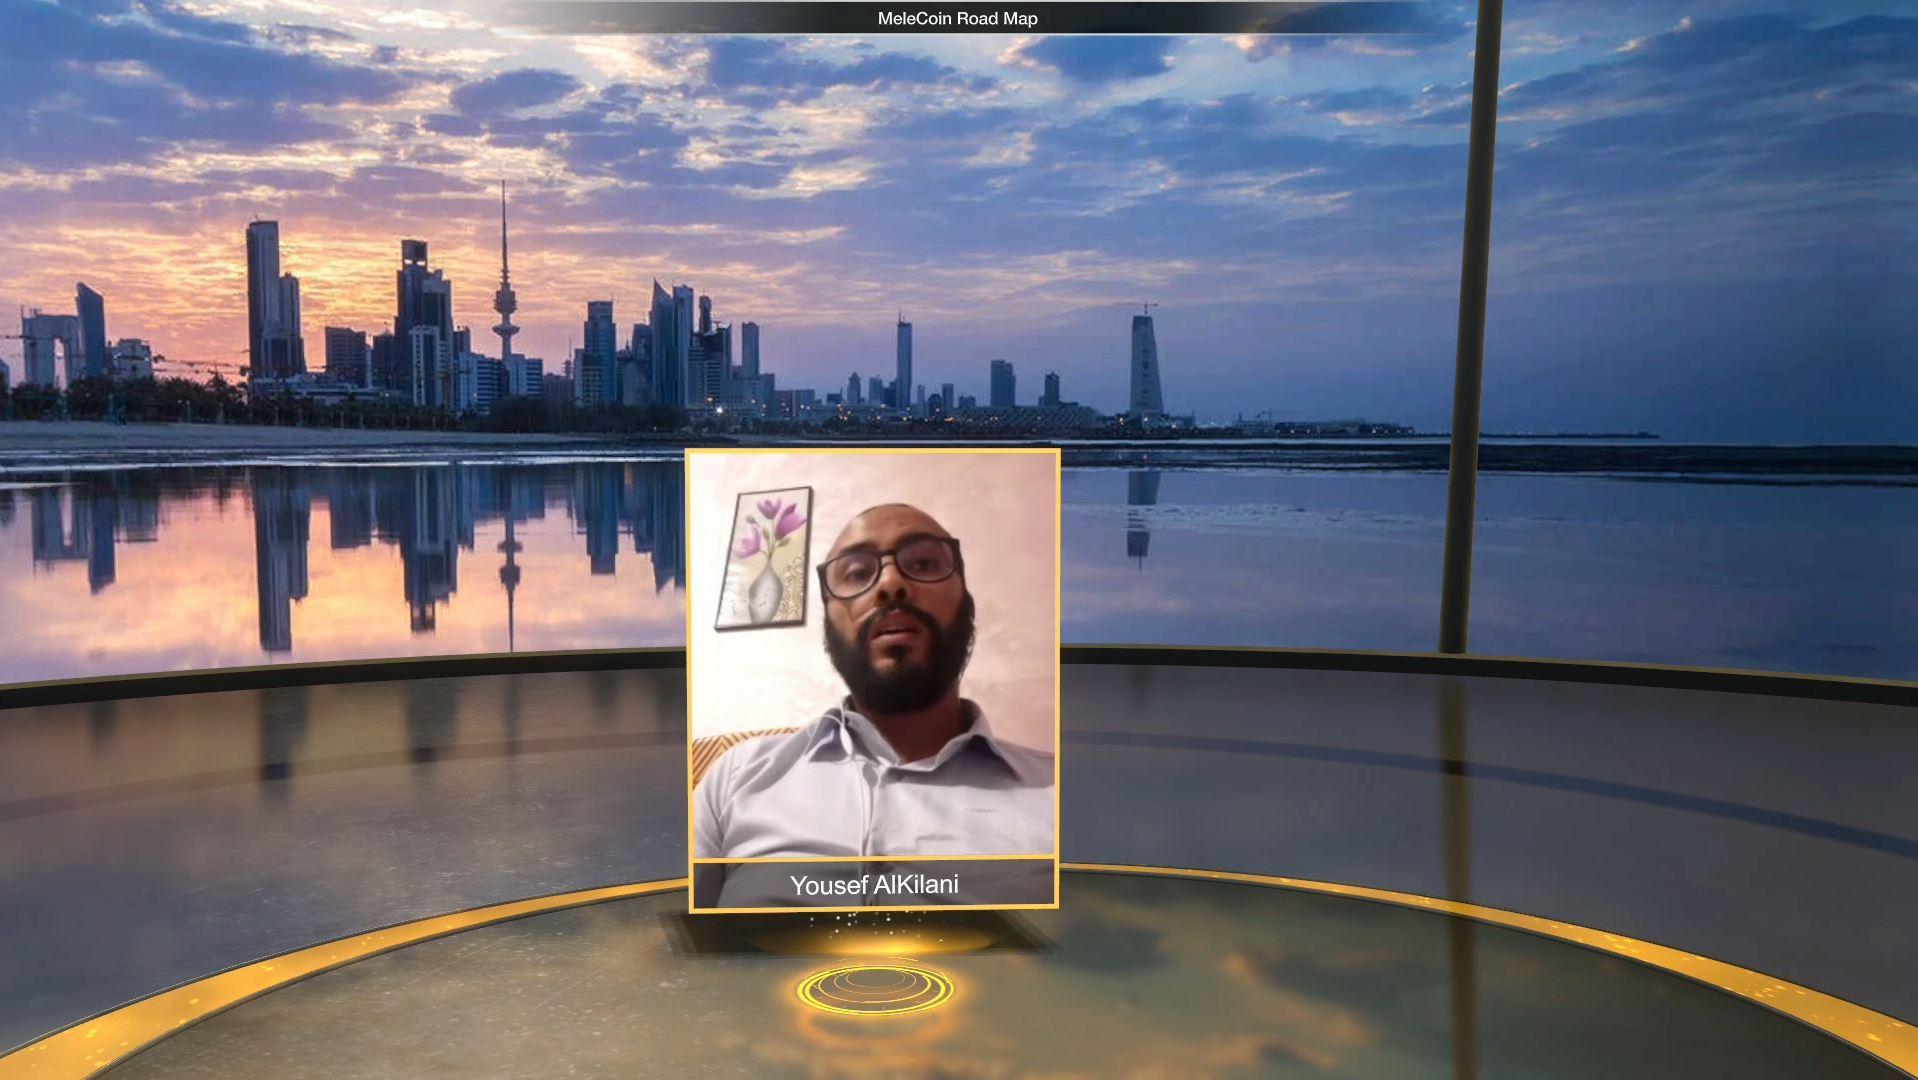 melecoin blockchain technology virtual event virtual speaker